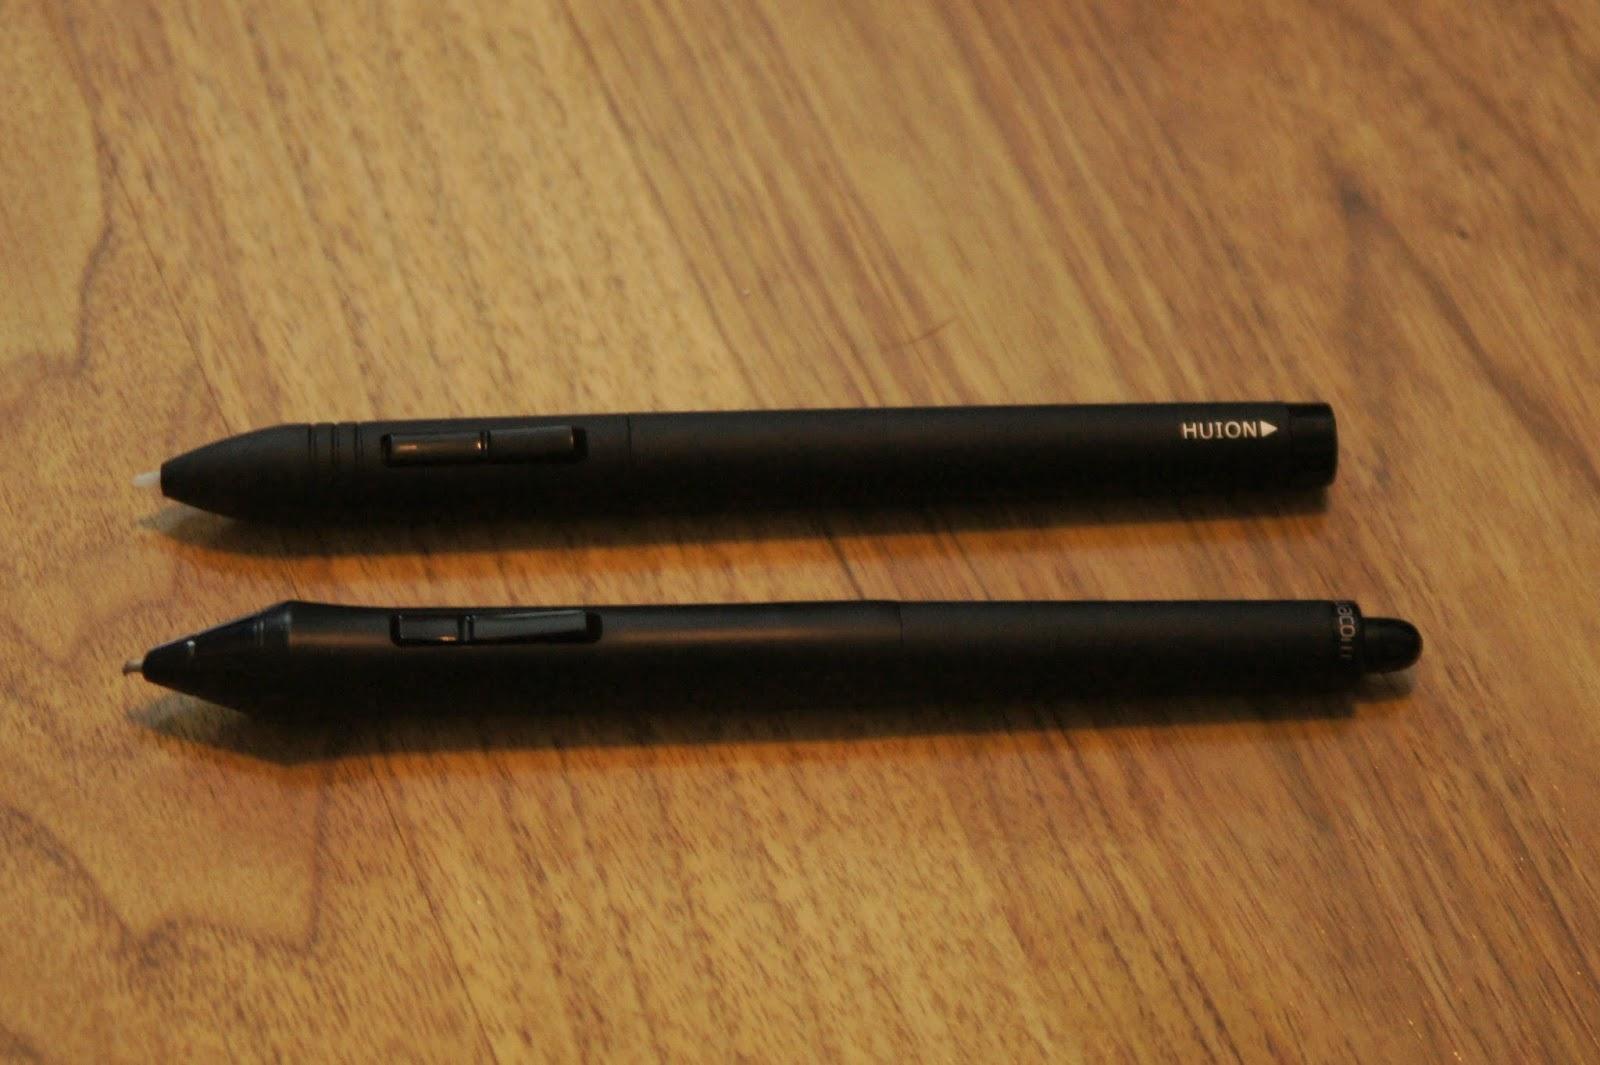 Josh's Art Blog: Product Review - Huion GT-190, an